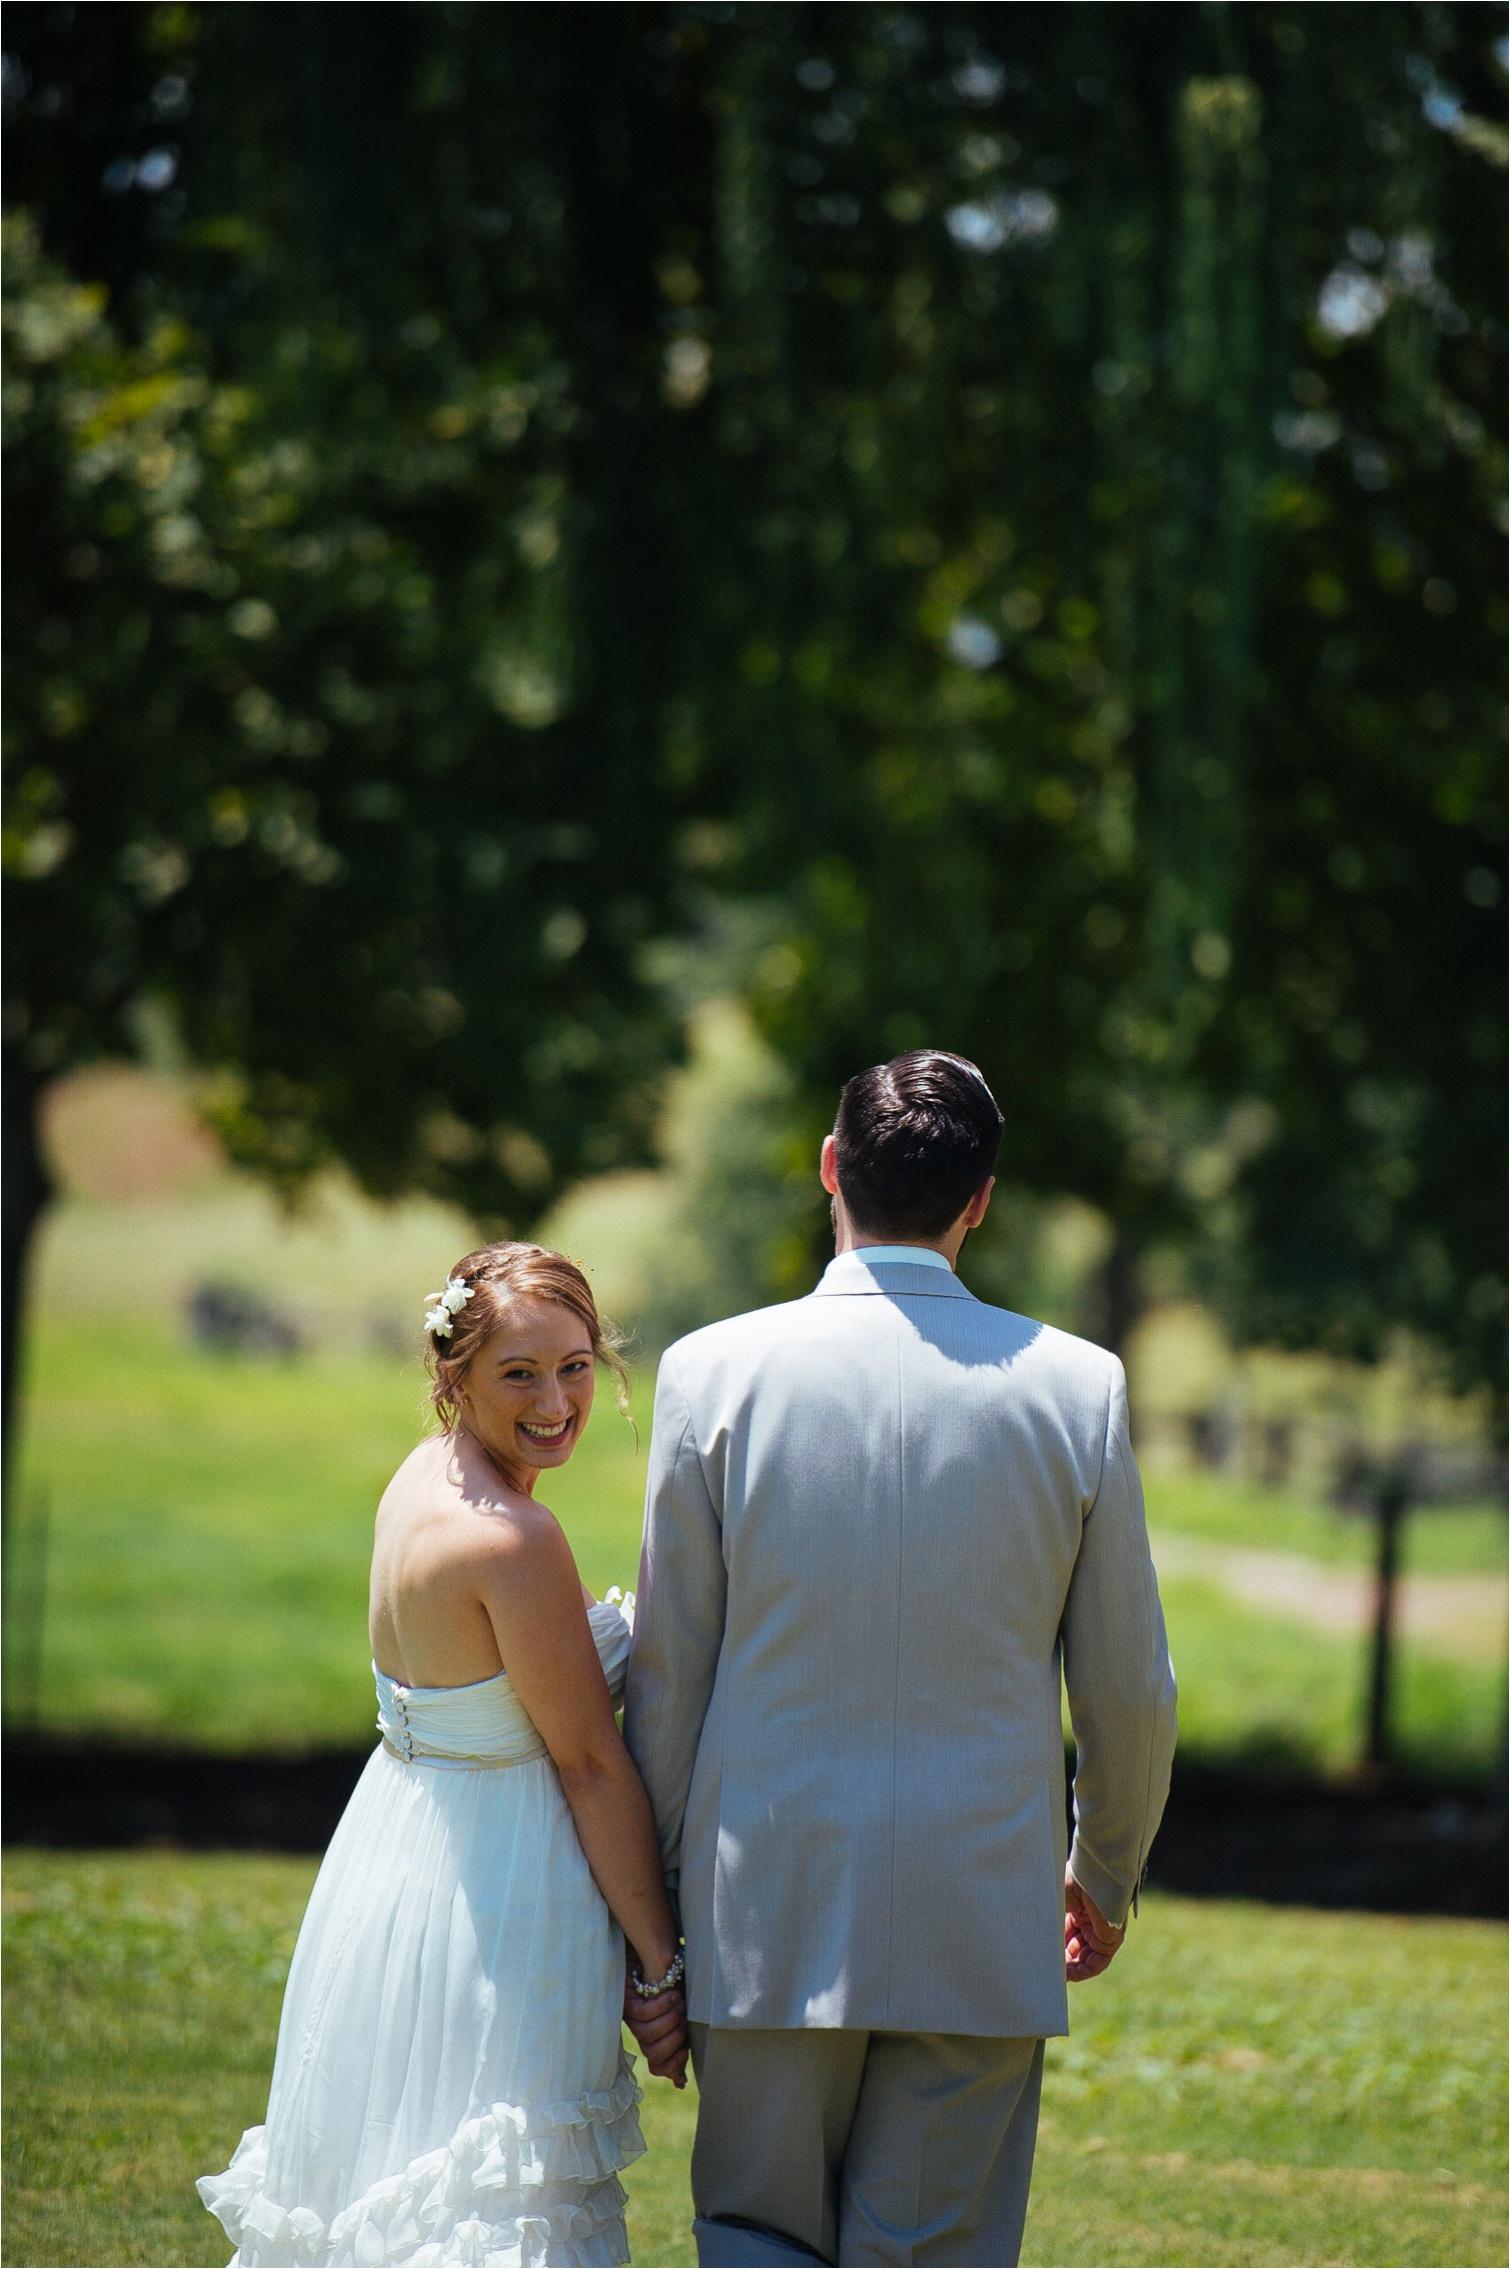 Jenny&Mitch_Sebel_Windsor_Sydney_Polo_Club_wedding-by_The_Follans_Gold_Coast_Wedding_Photographers_0030.jpg